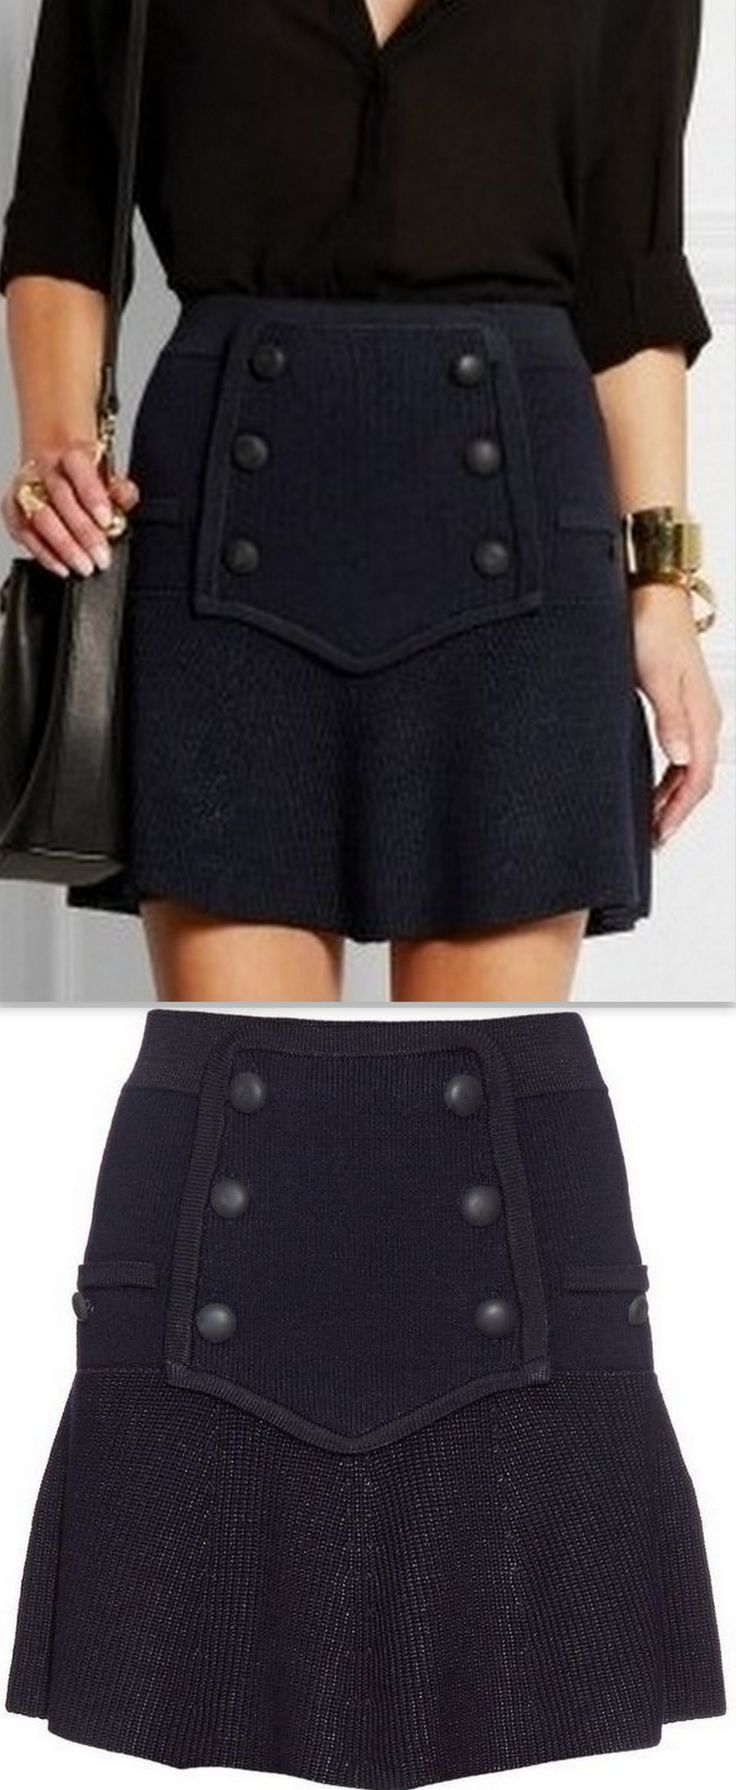 Cashmere & Wool Blend Knit Skirt With Buttons, Dark Navy Blue